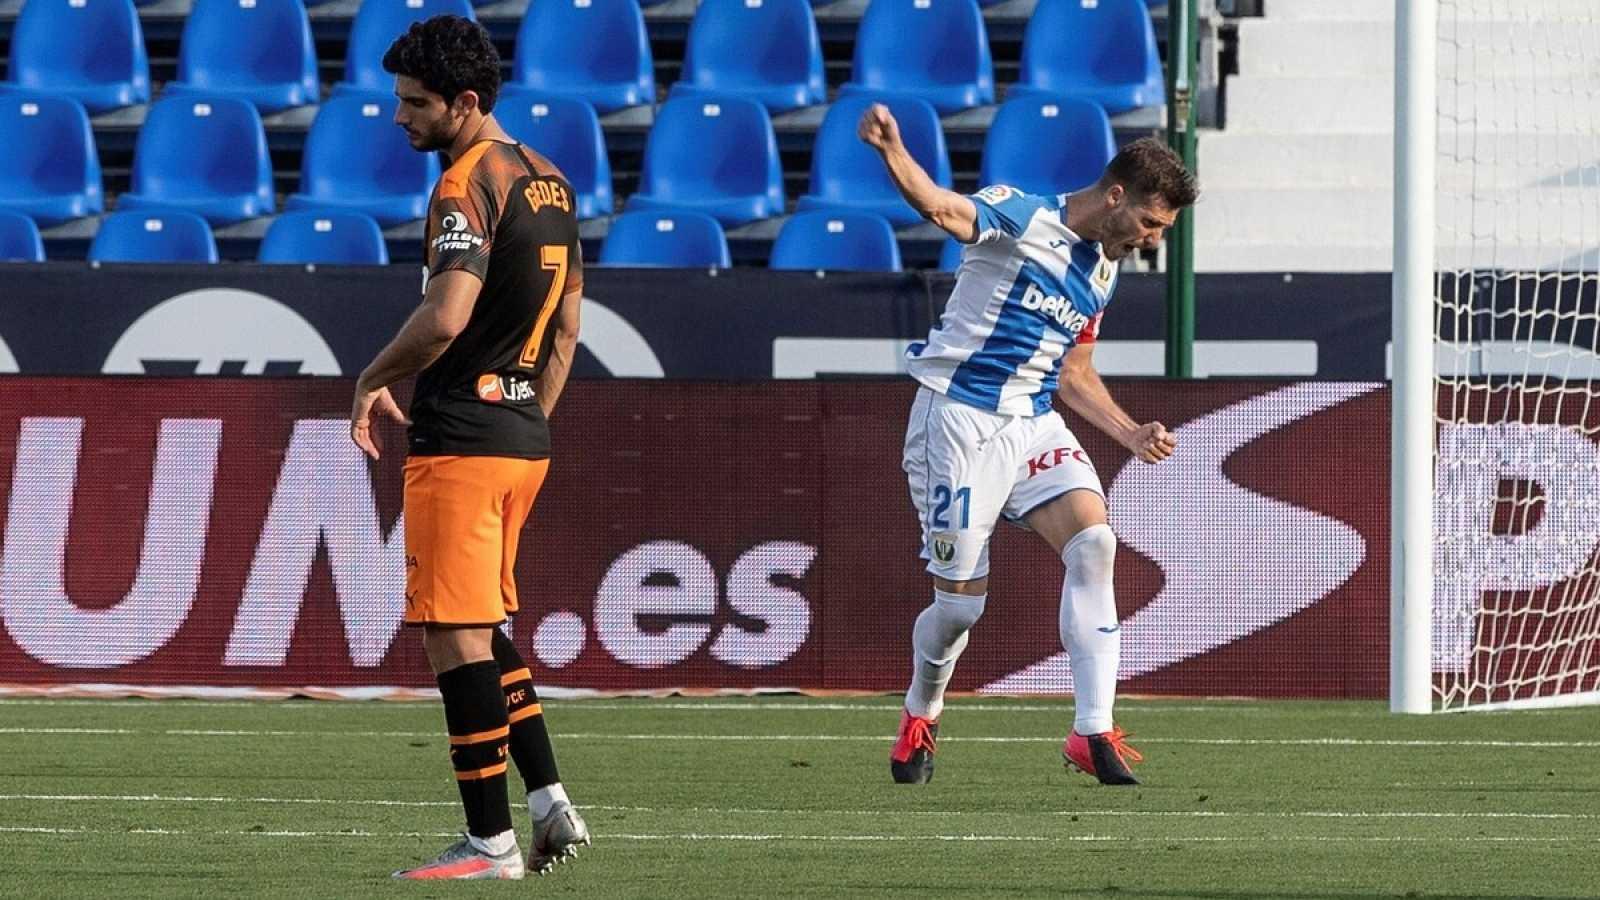 Imagen: Rubén Pérez (d) celebra su gol de penalti ante el lamento de Guedes (i)